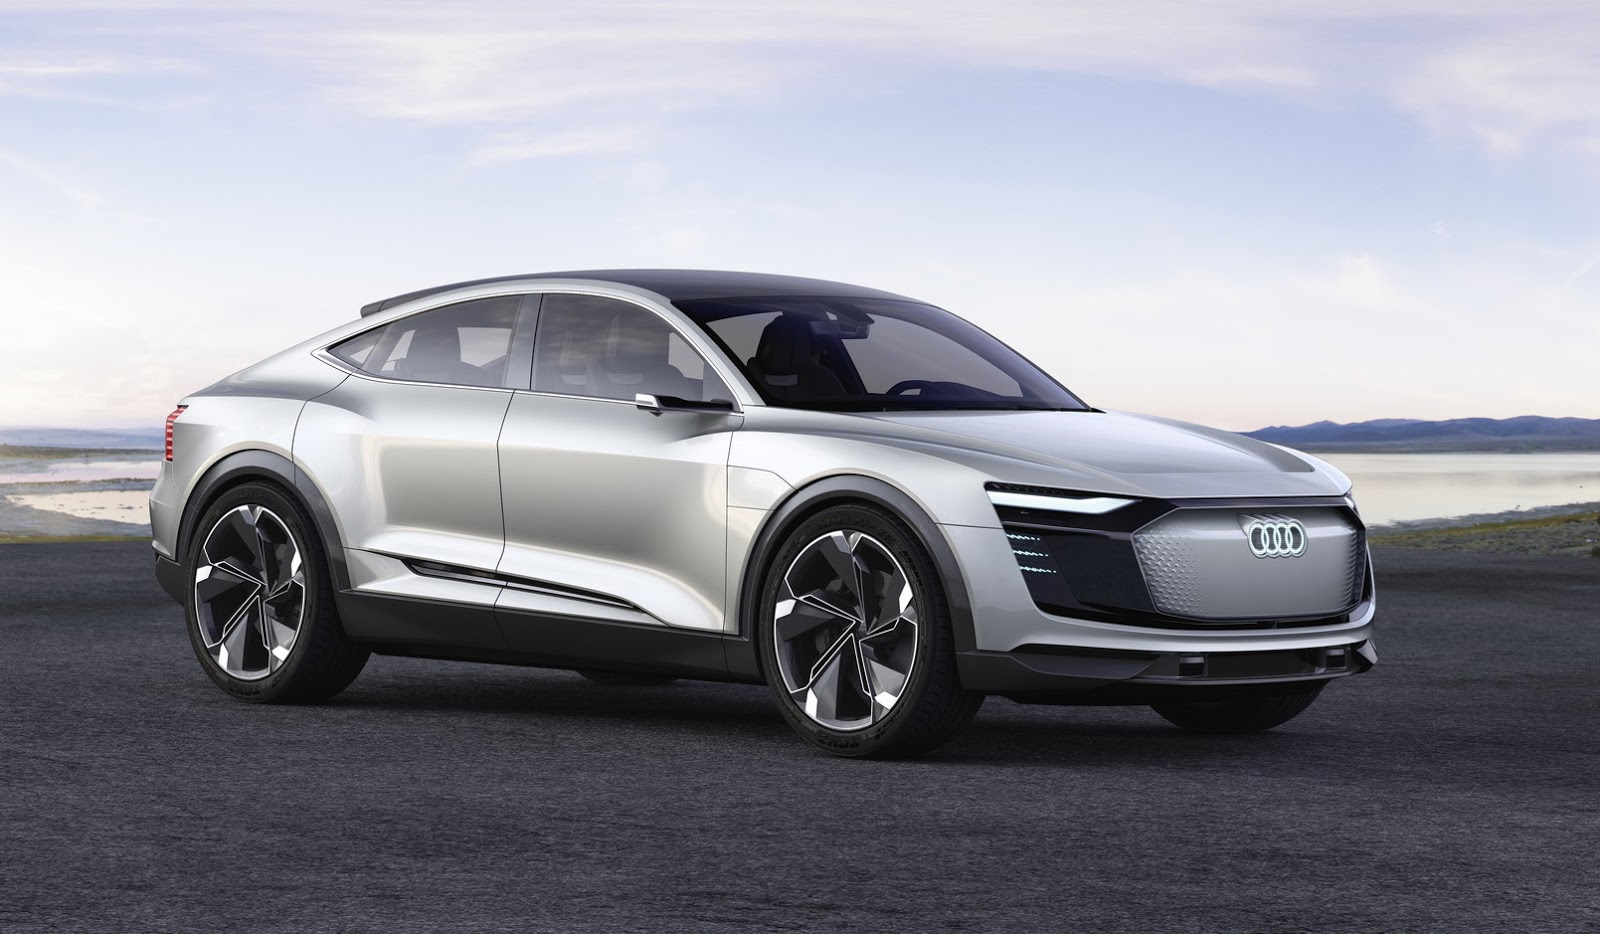 Ауди создаст конкурента бюджетному Tesla Model 3